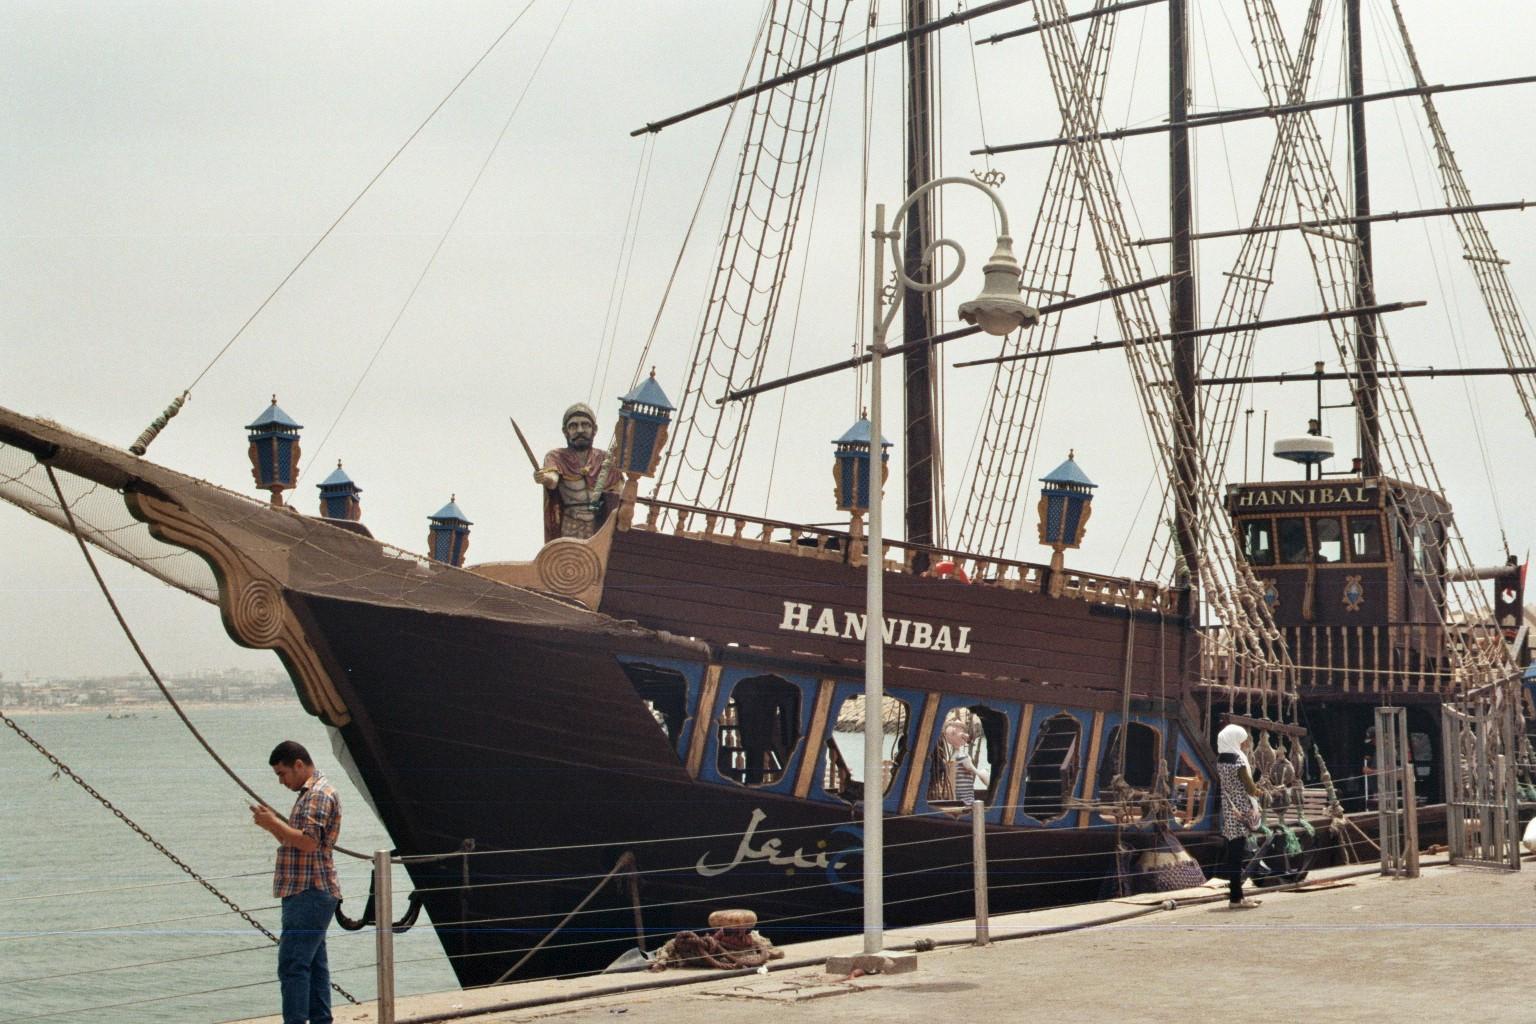 Am Hafen in Agadir - Hannibal